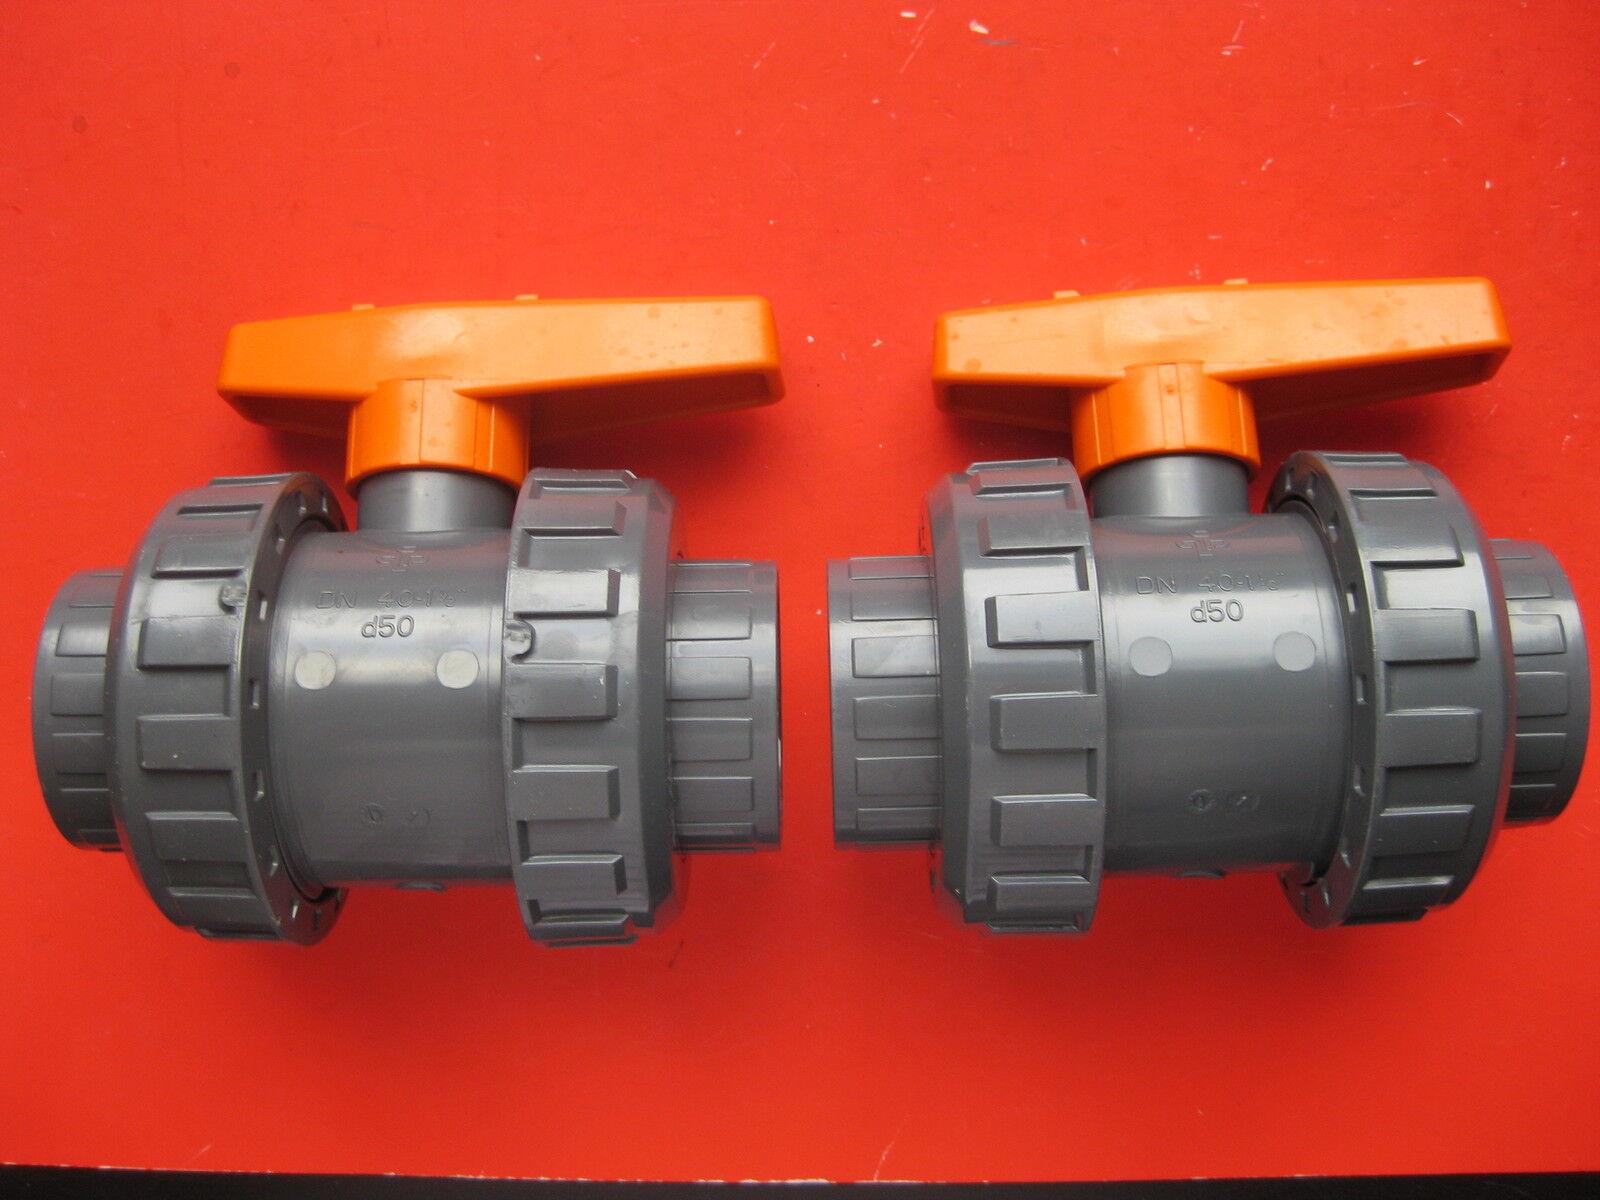 2 x Kugelhahn 2-Wege S6 PVC d 50 mm DN 40 Ventil Pool Hahn Praher 125462